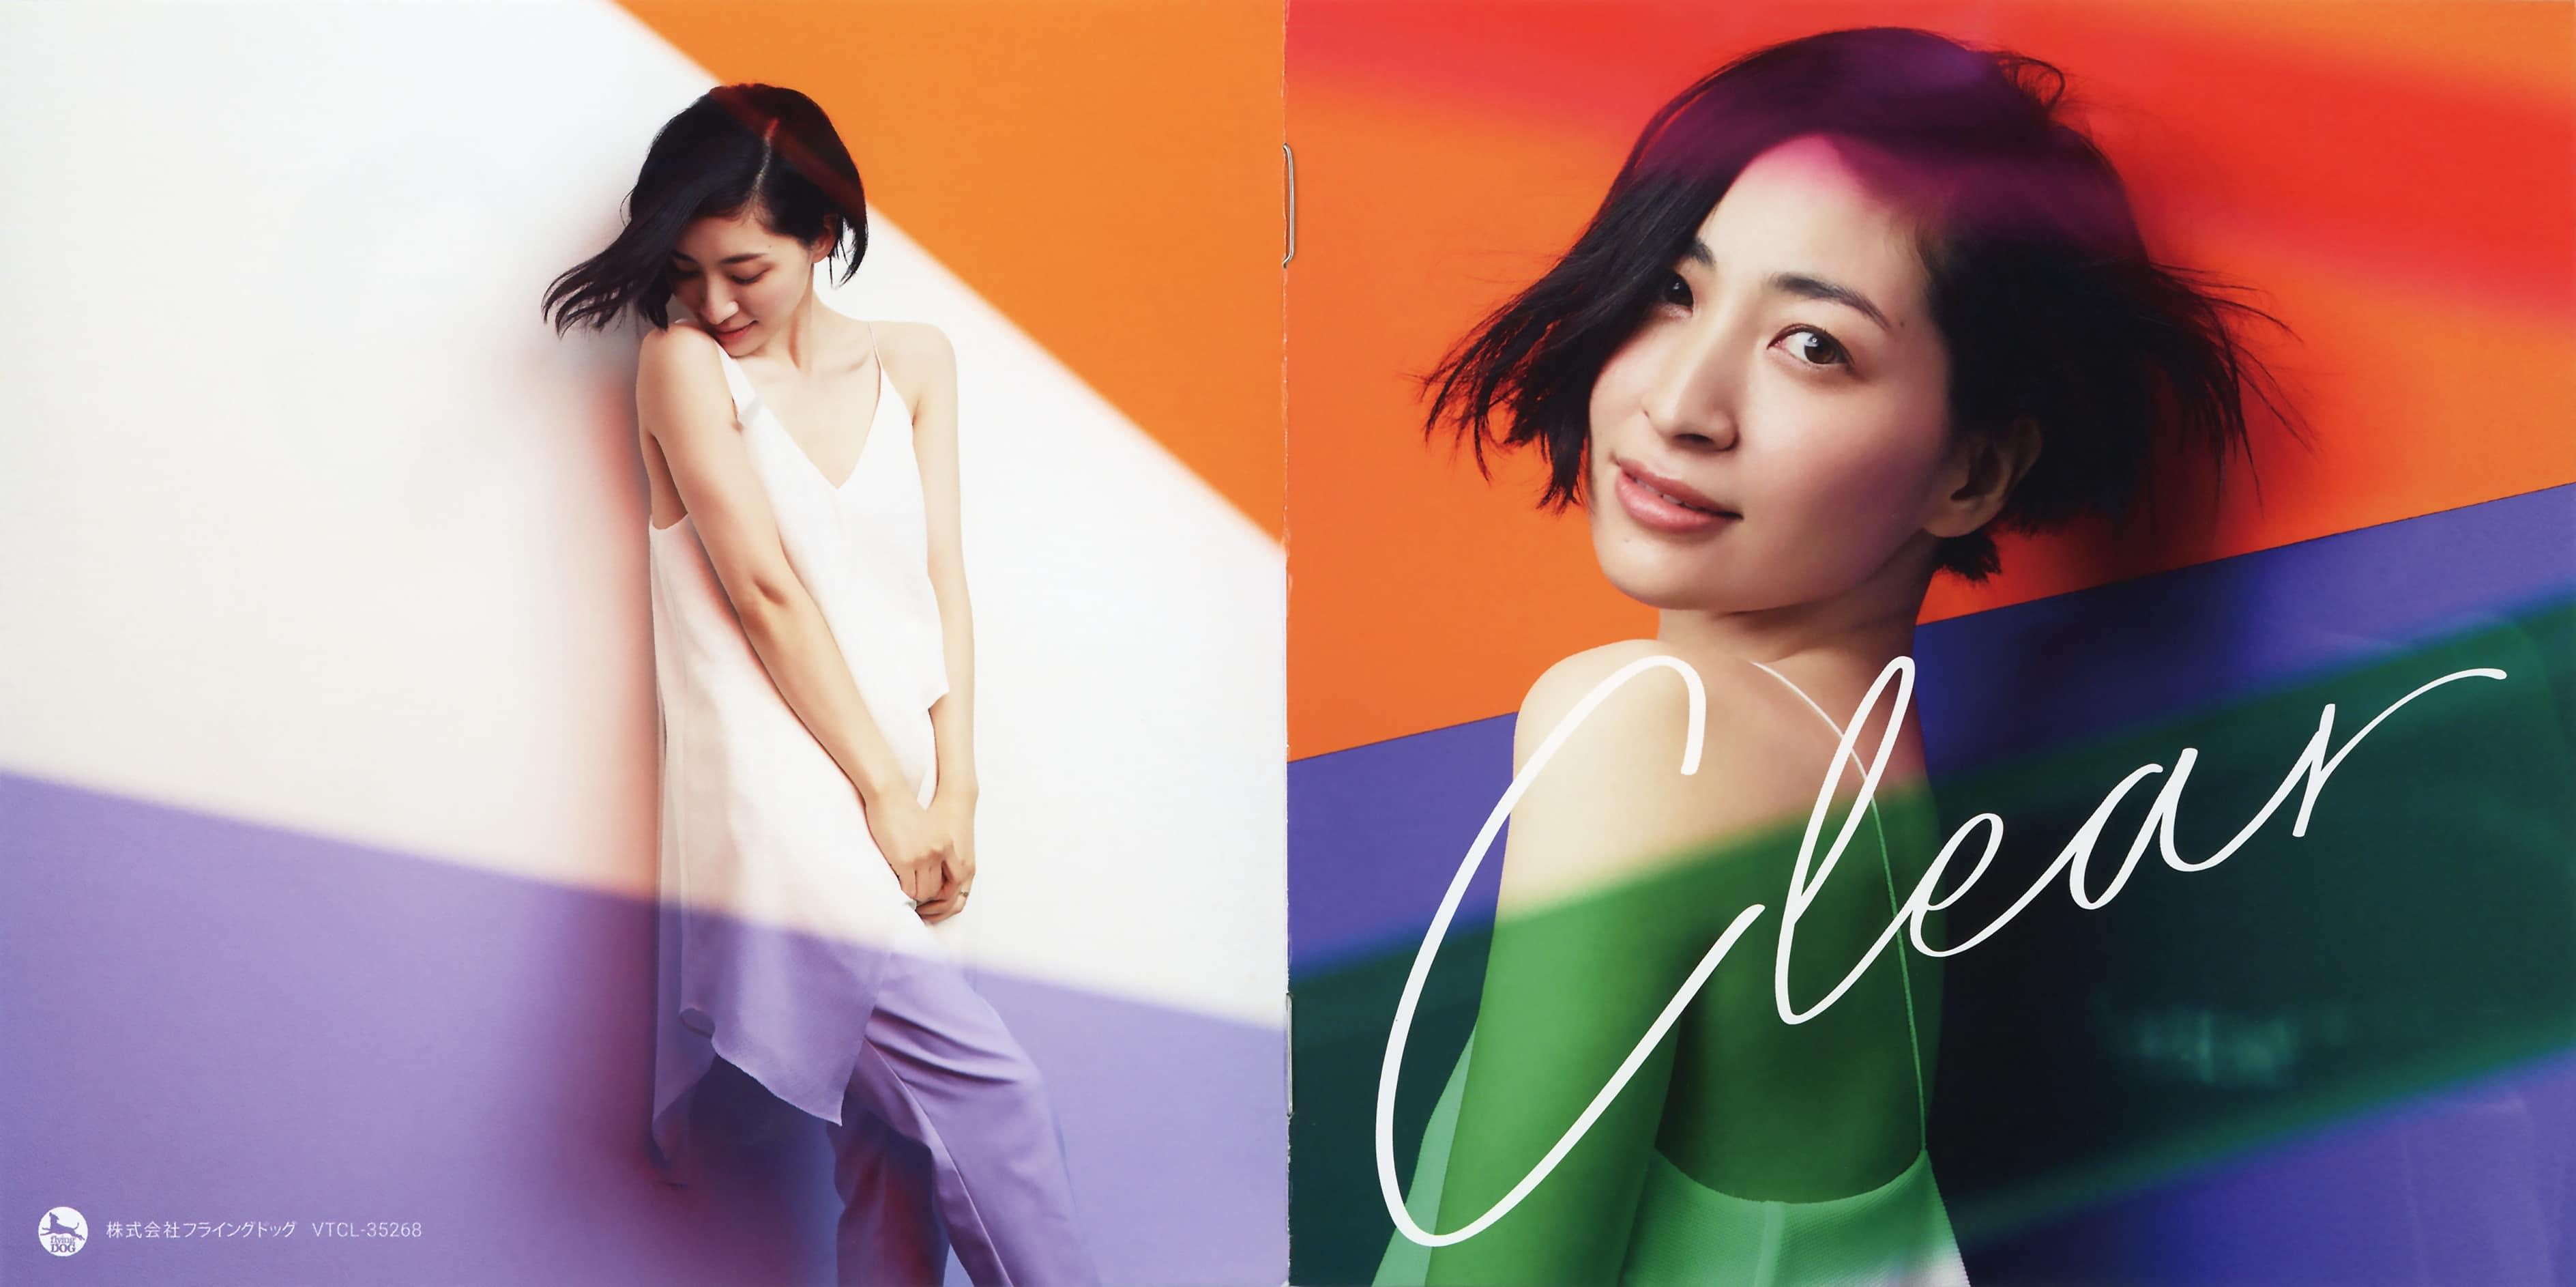 maaya sakamoto clear cd cover & video musical